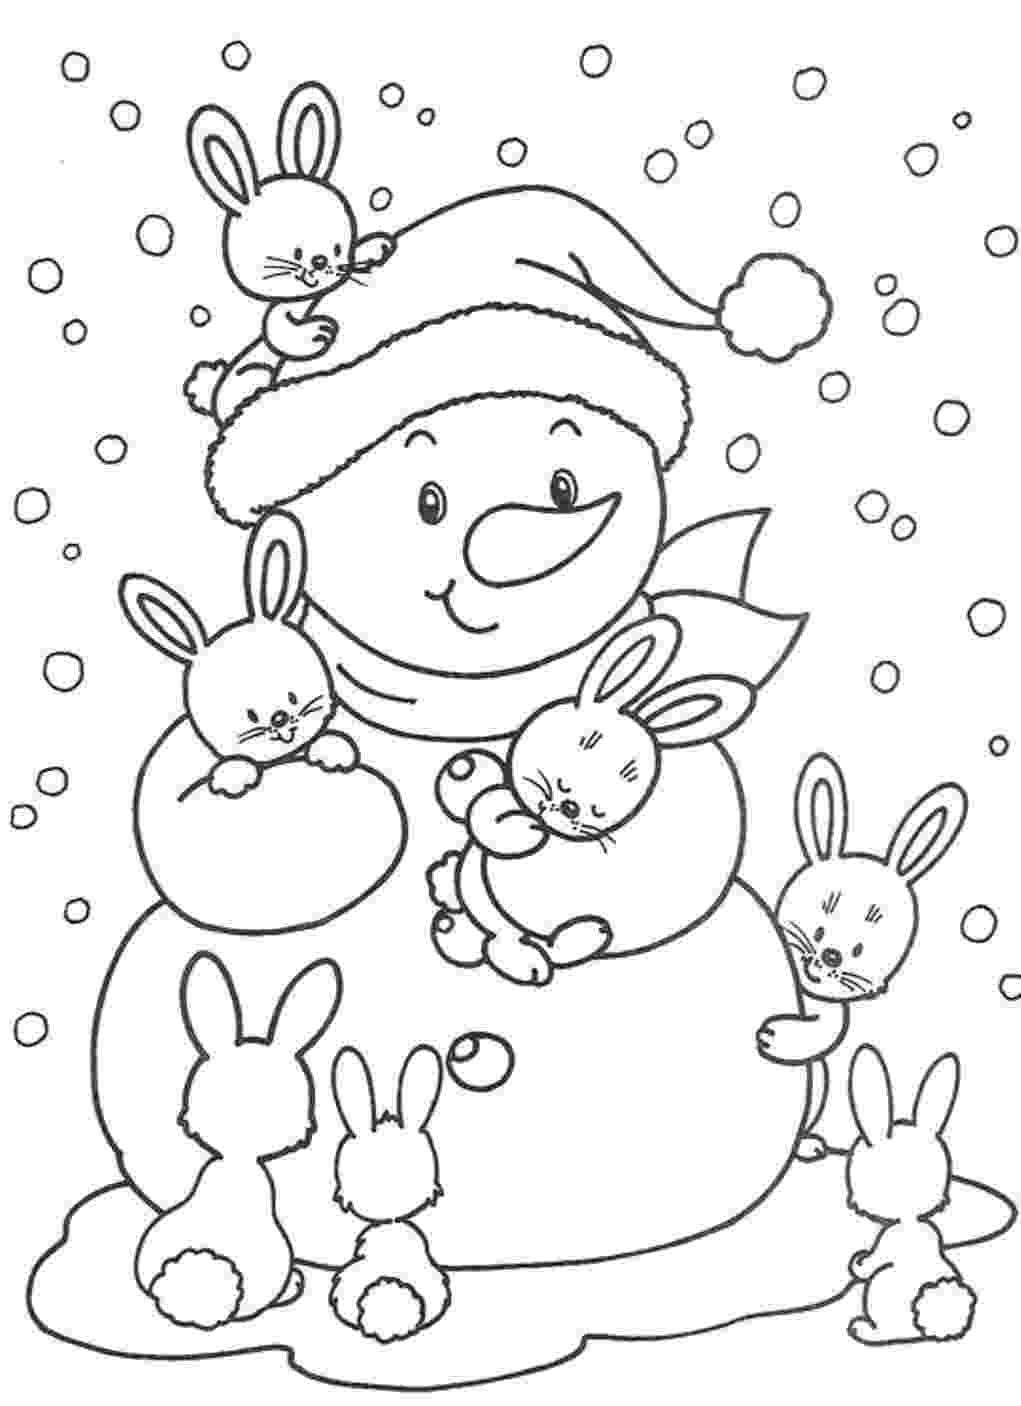 winter coloring book winter color sheet coloring pages winter coloring pages coloring book winter